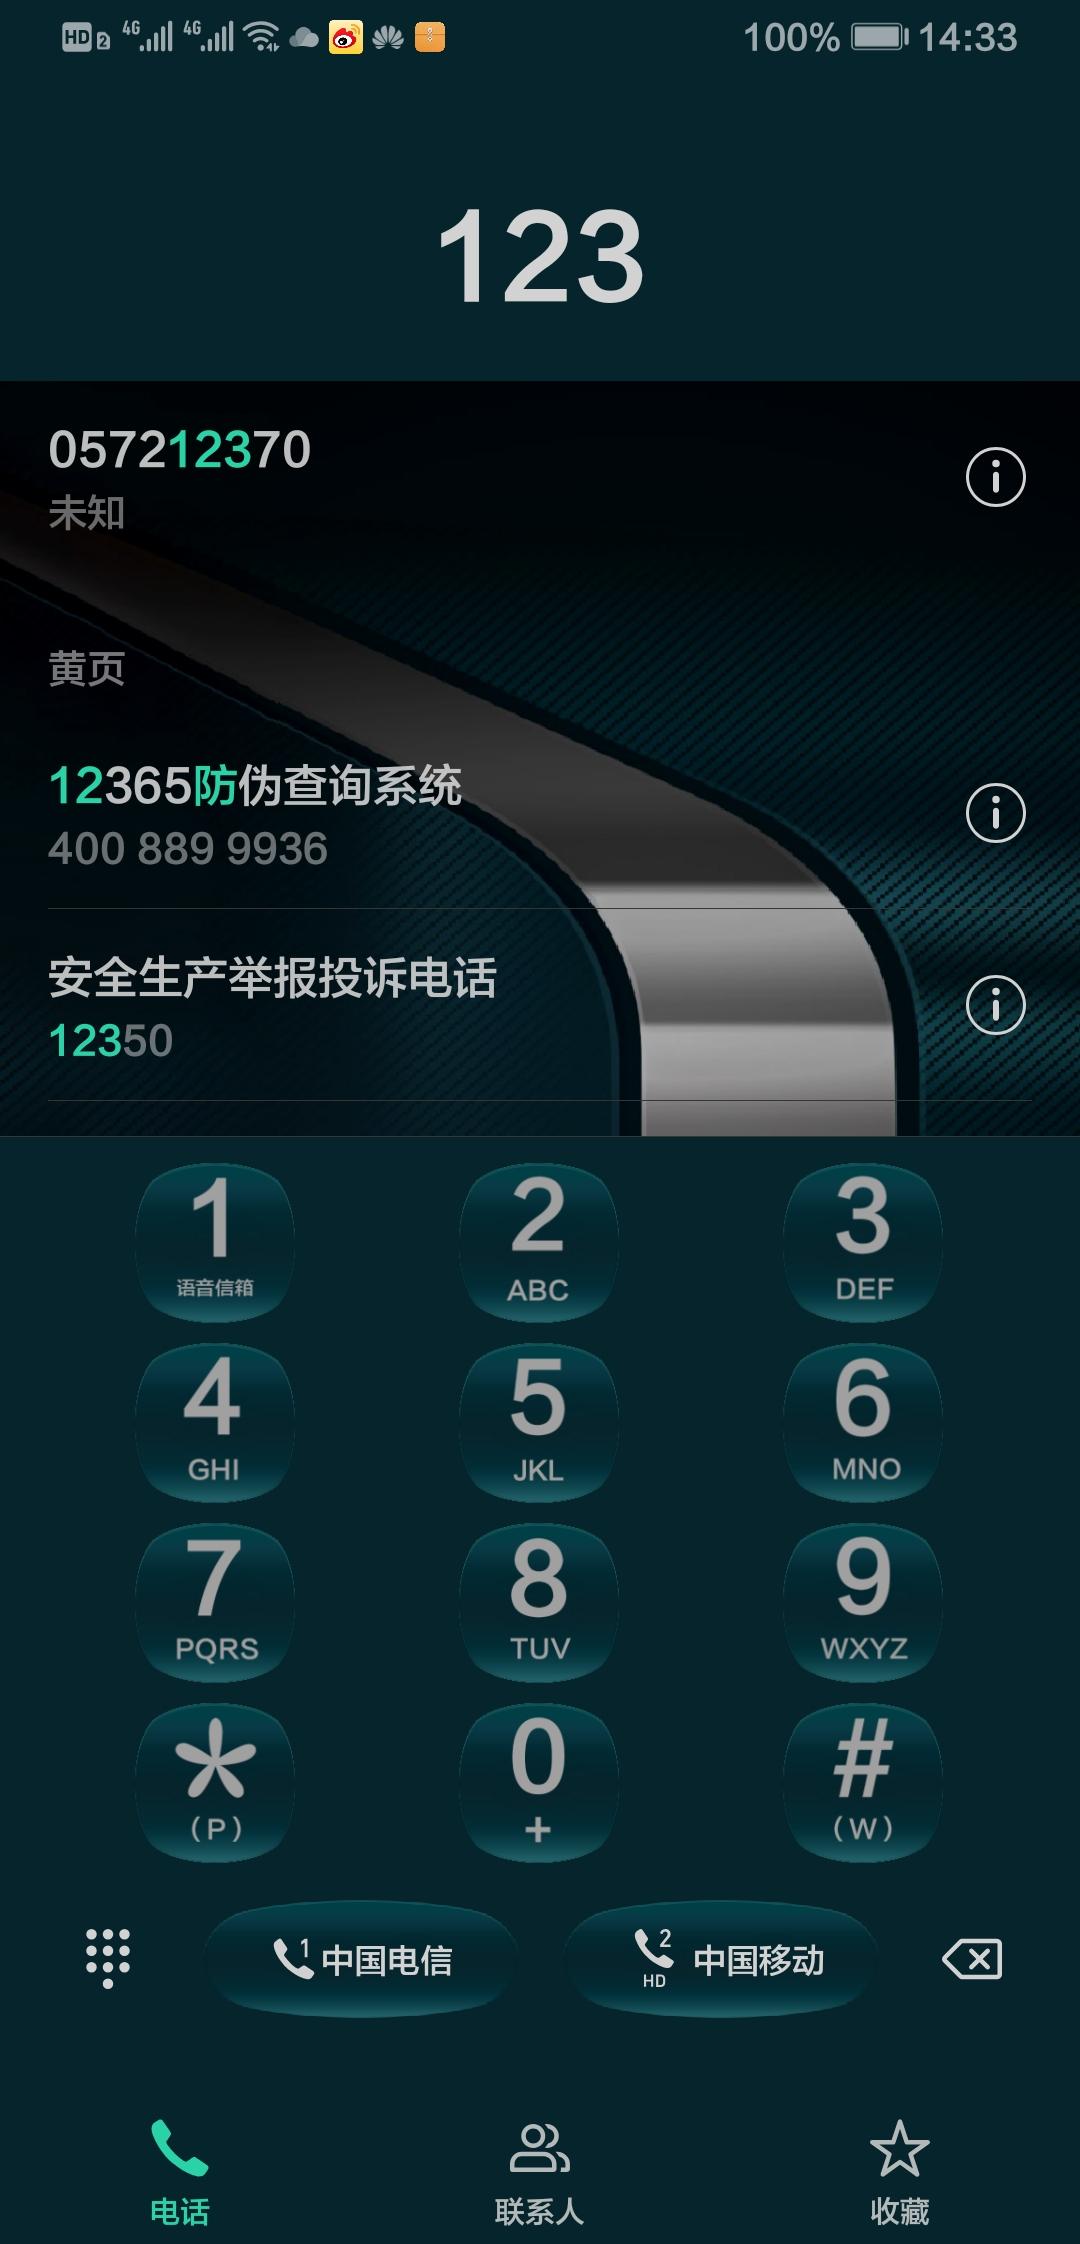 Screenshot_20190623_143333_com.android.contacts.jpg